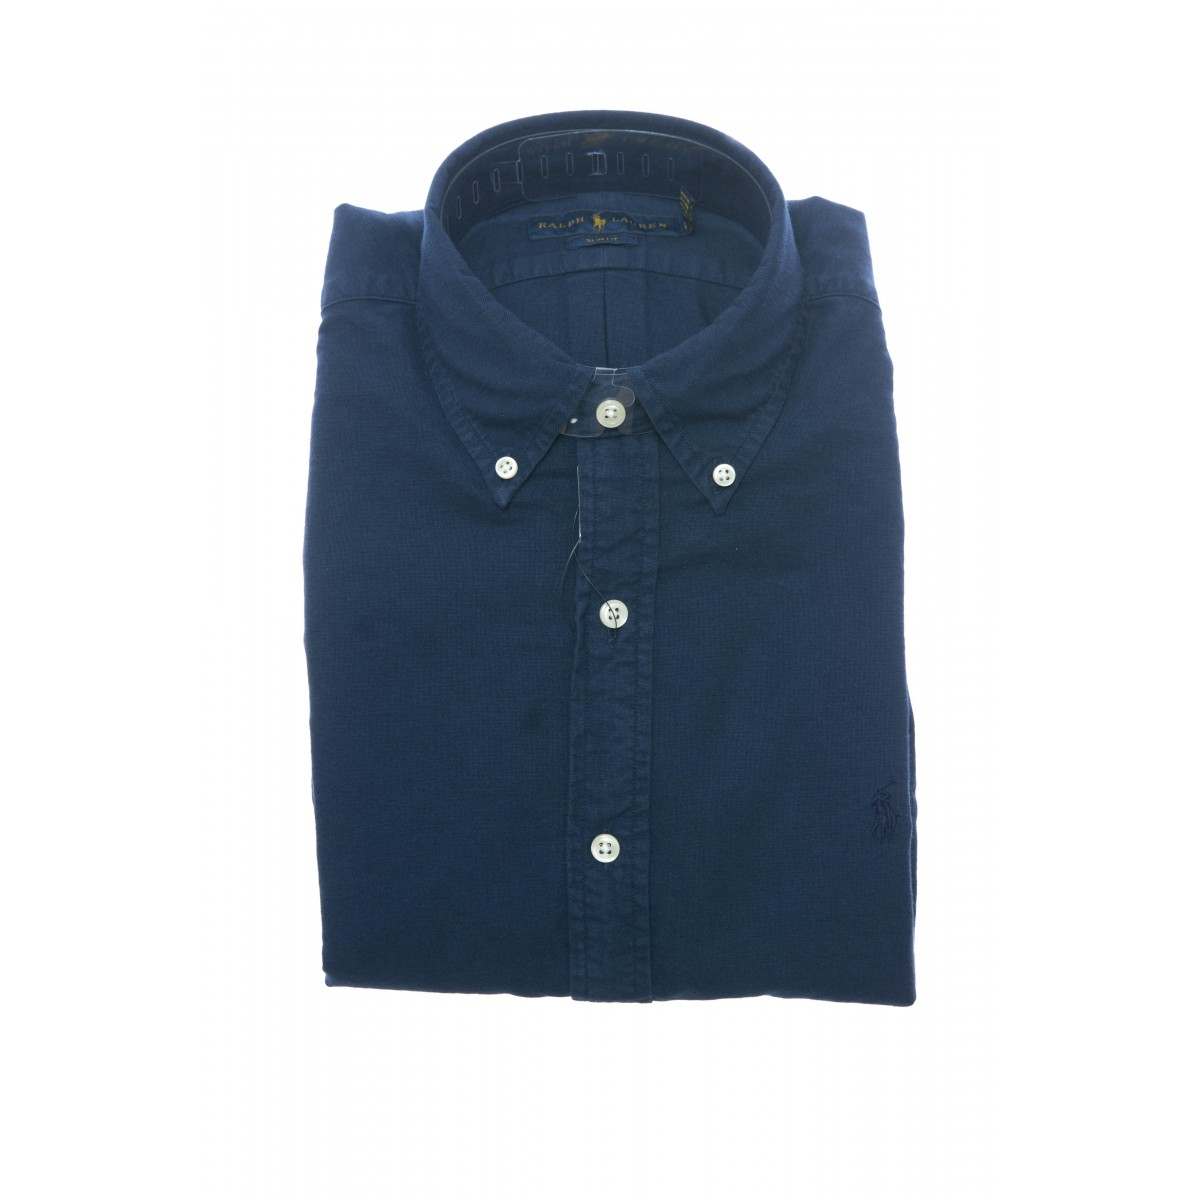 Camicia uomo - 767447 slim tinta unita